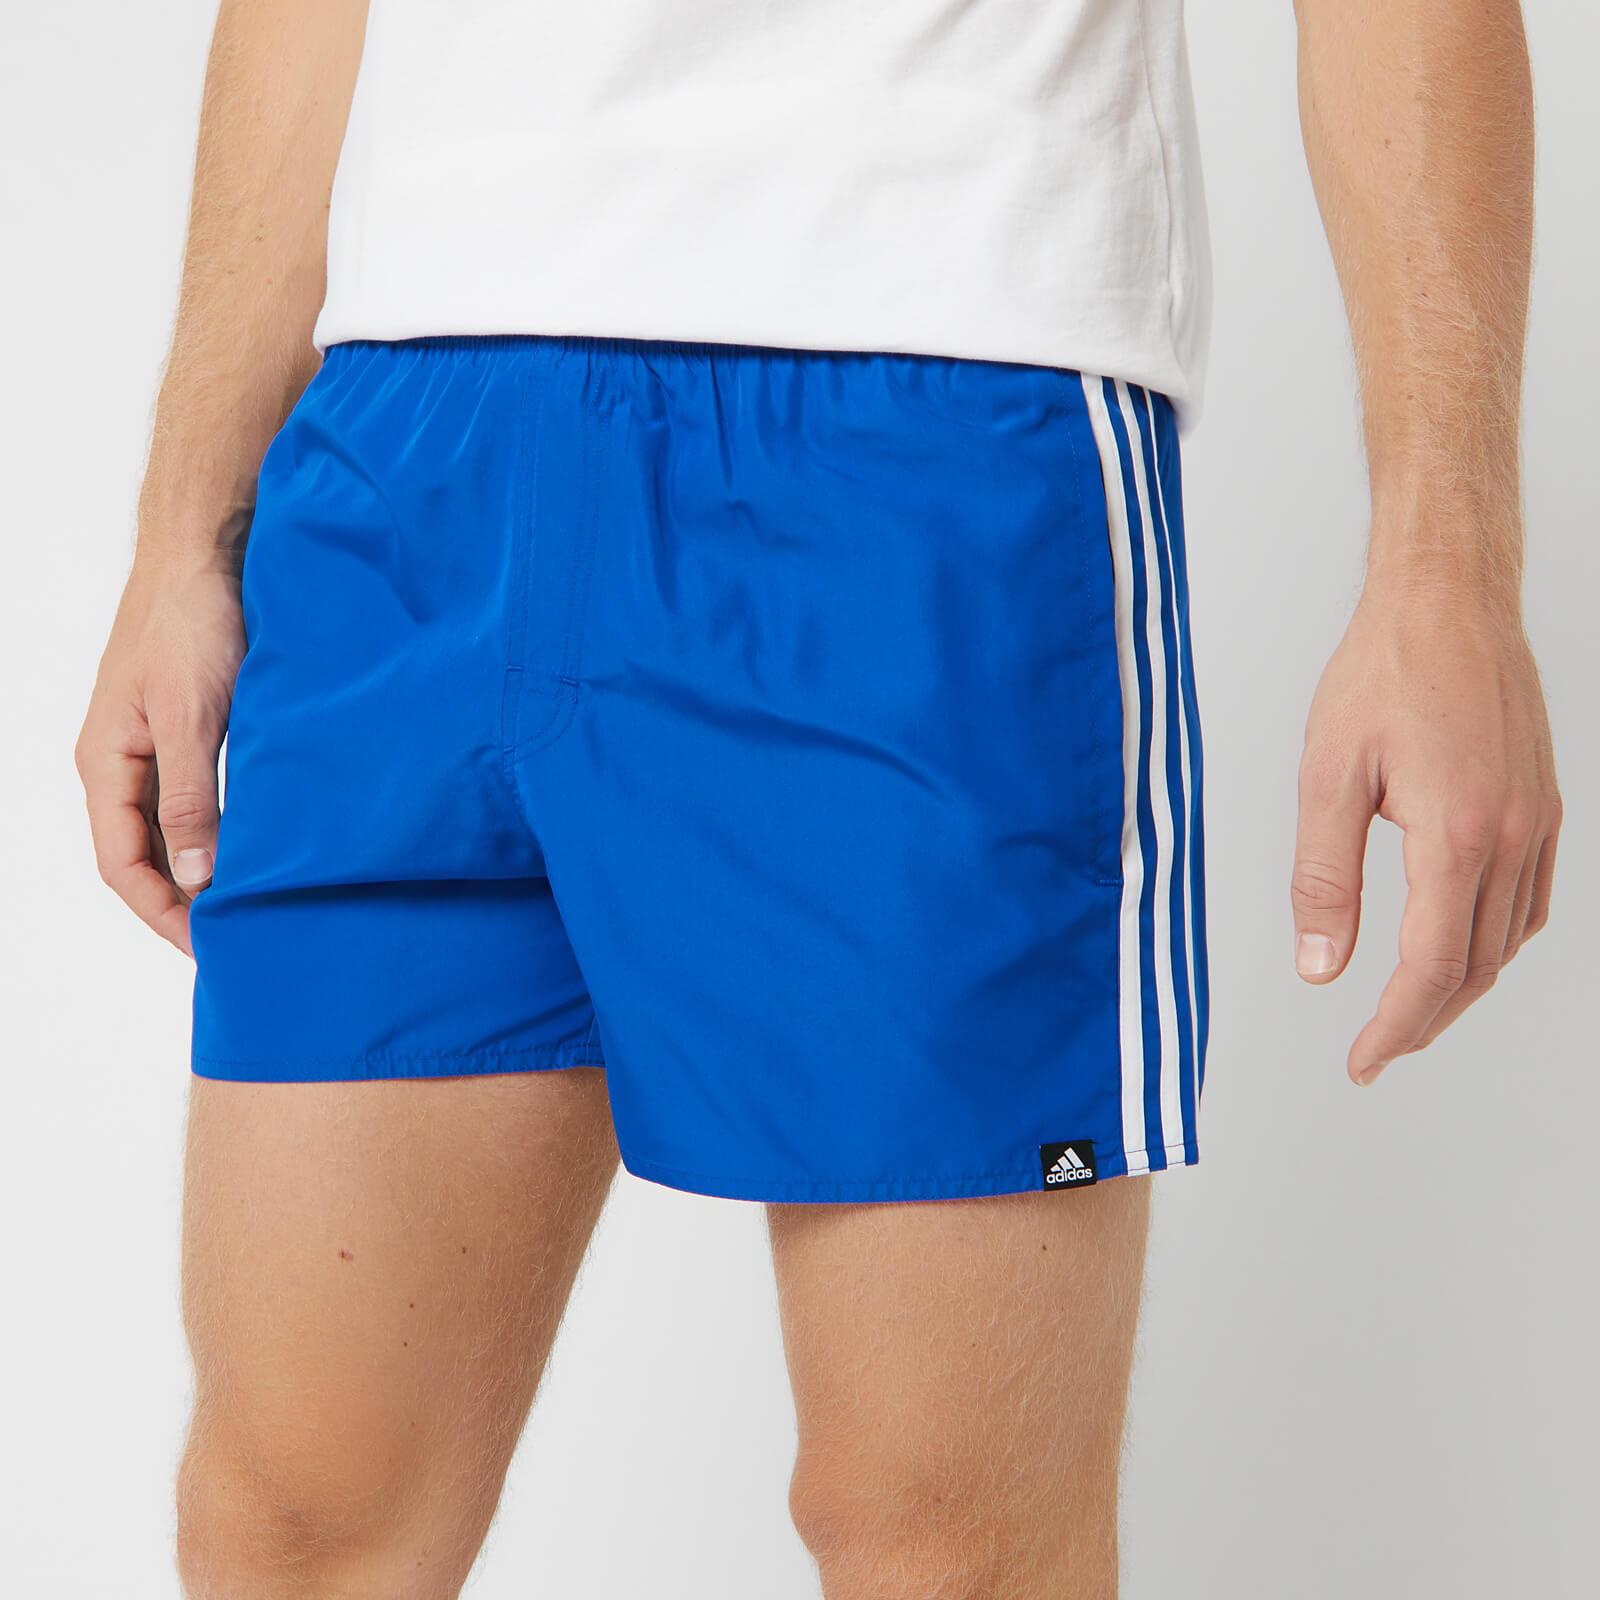 adidas Men's 3 Stripe Swim Shorts - Blue - S - Blue